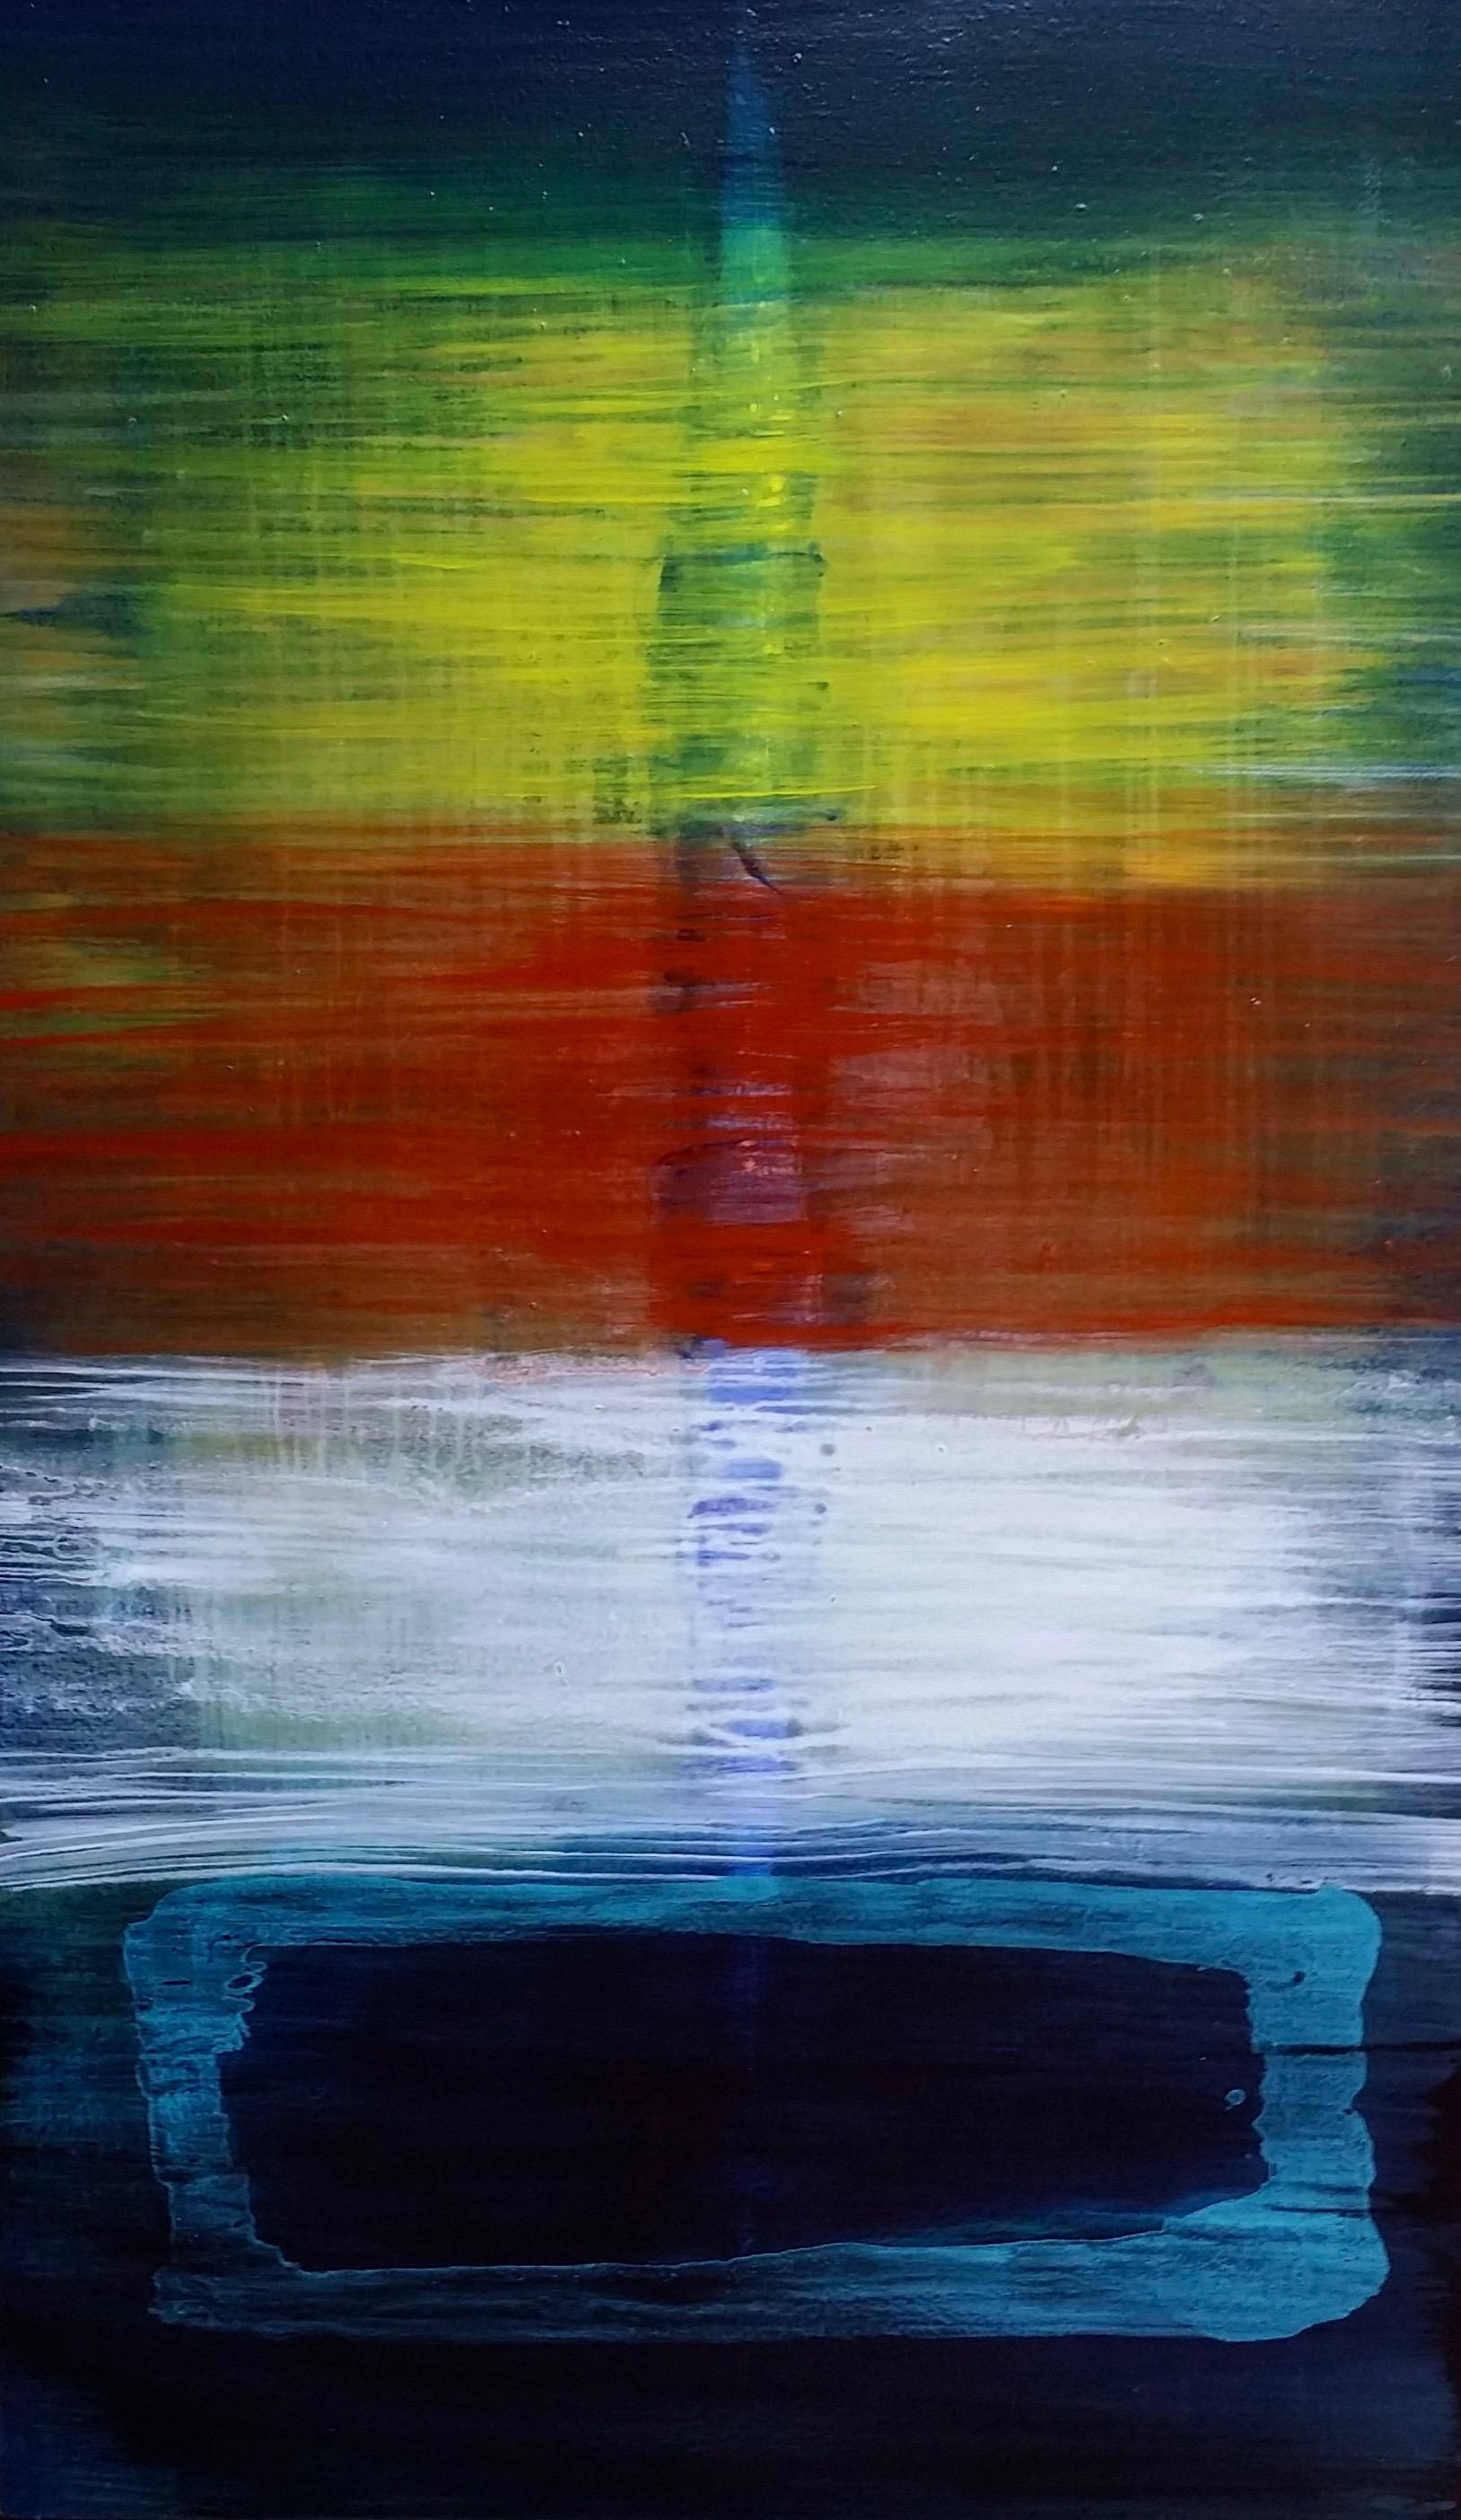 Strata, 2018  60 x 36 inches  Acrylic on canvas